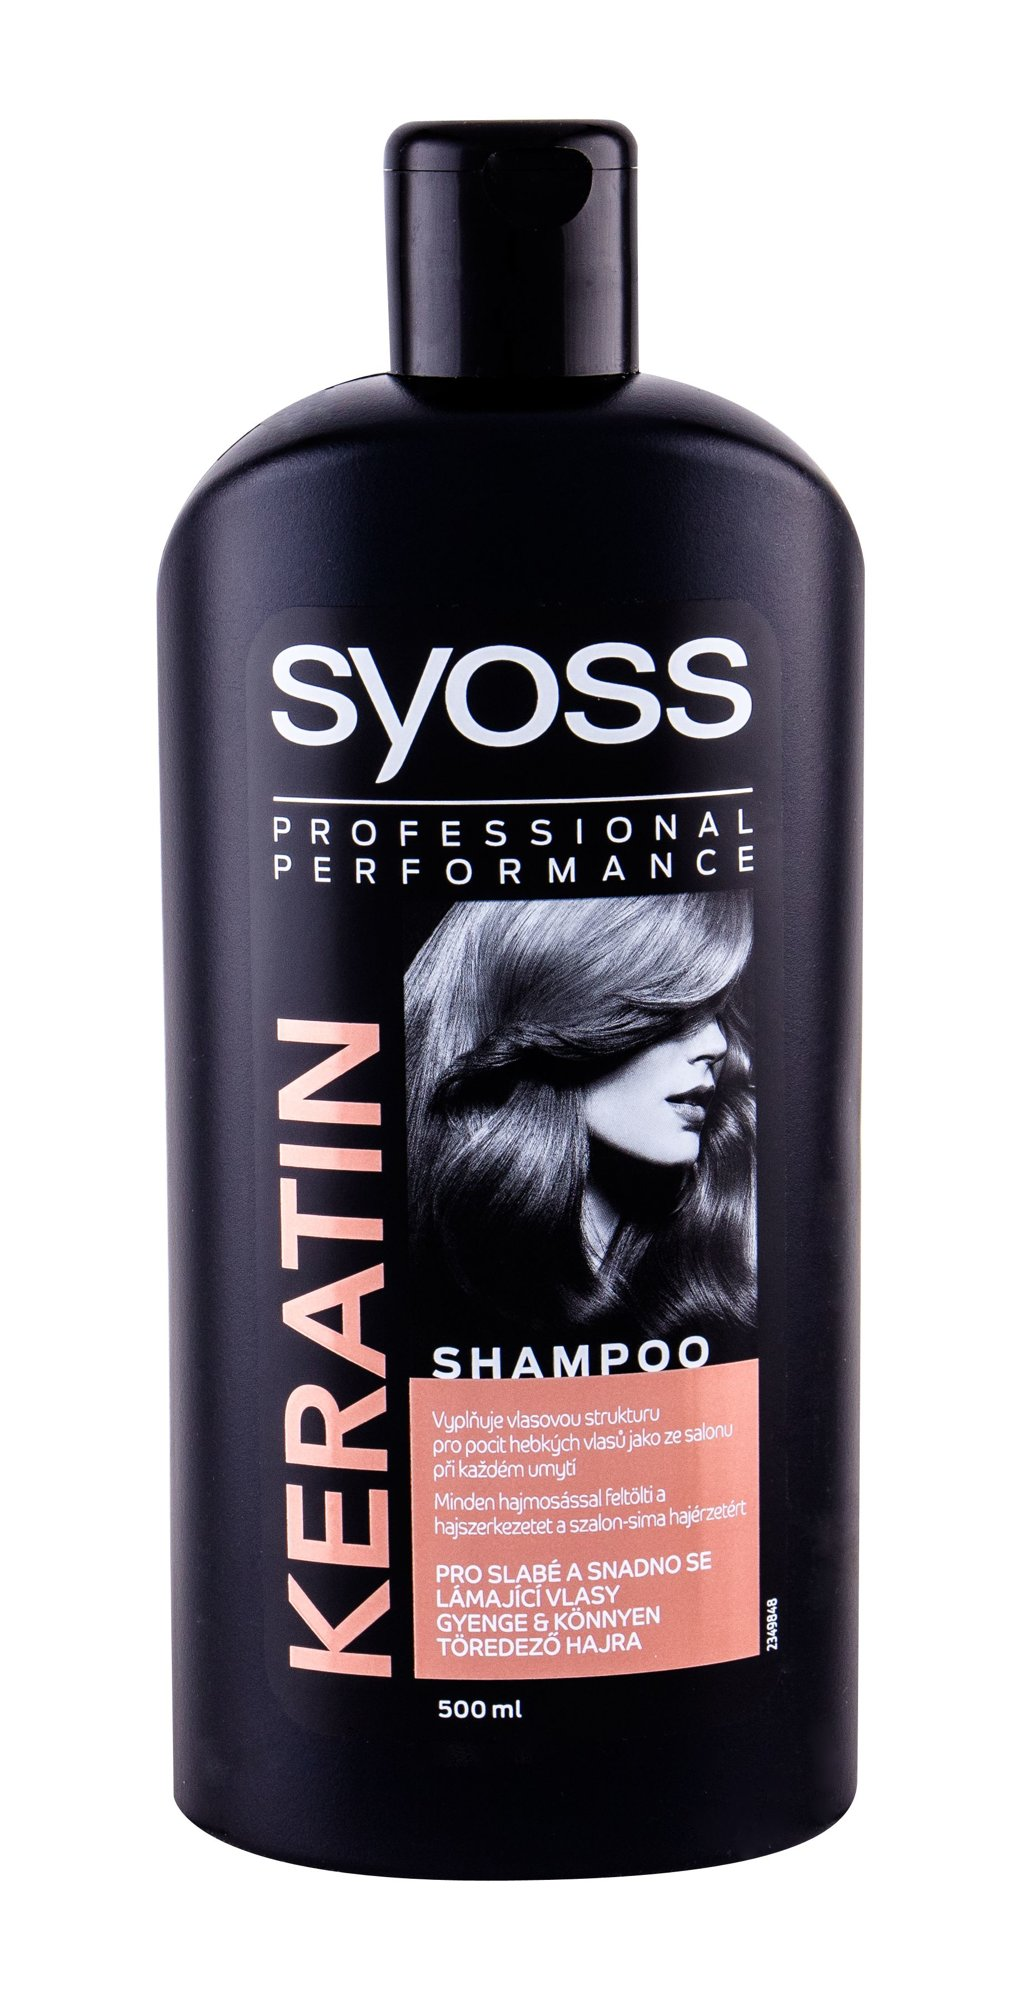 Syoss Professional Performance Keratin Shampoo 500ml